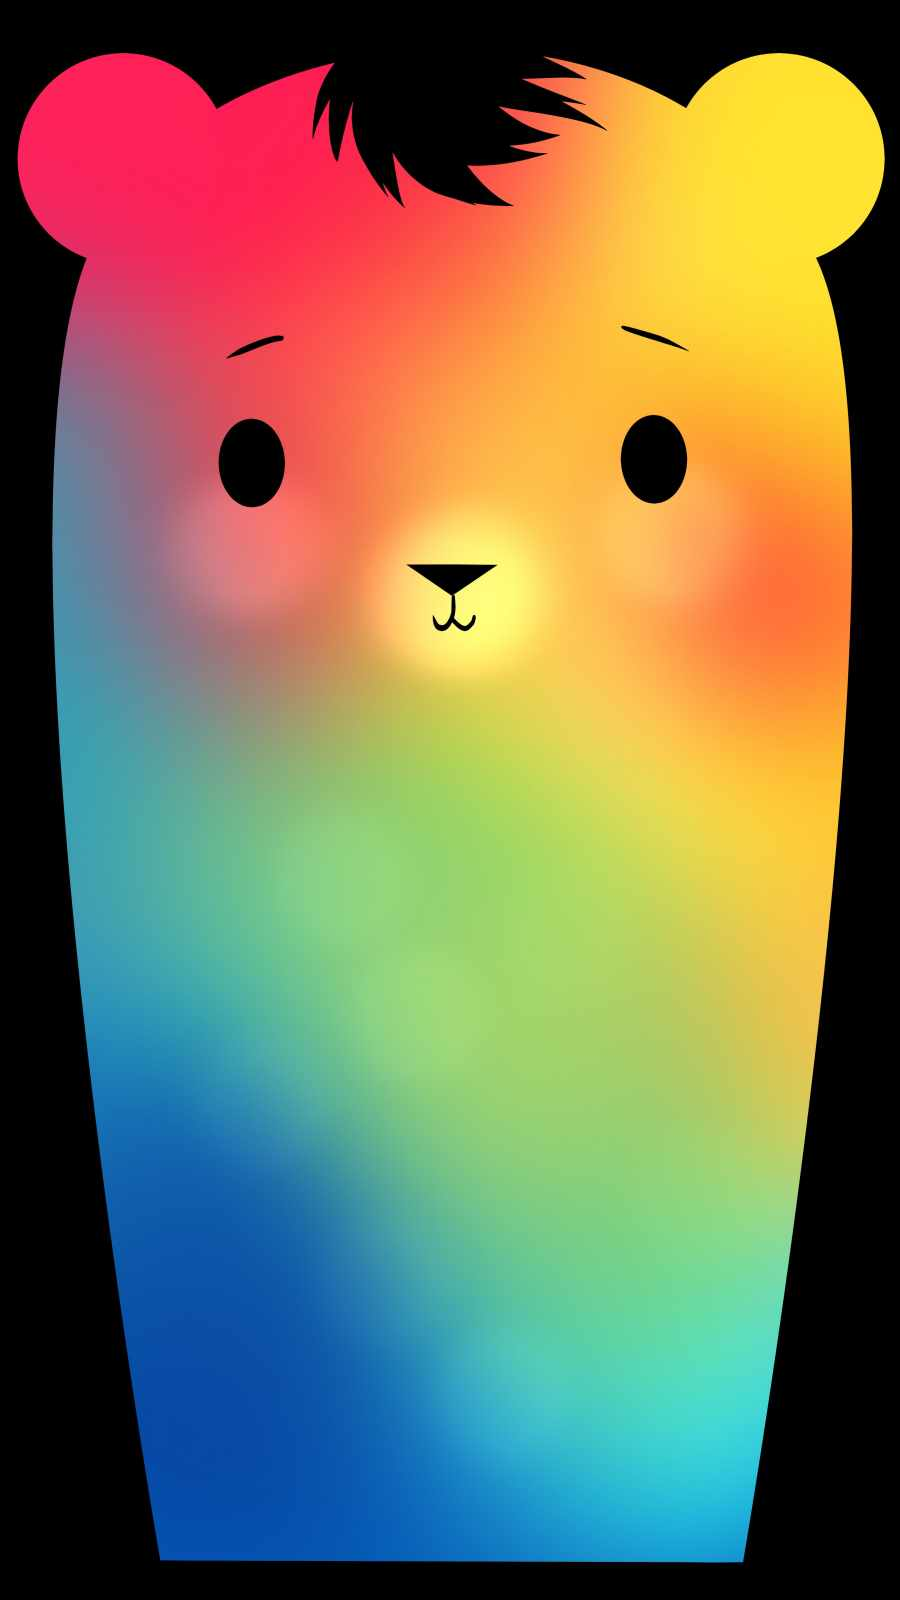 Winnie The Pooh iPhone Wallpaper